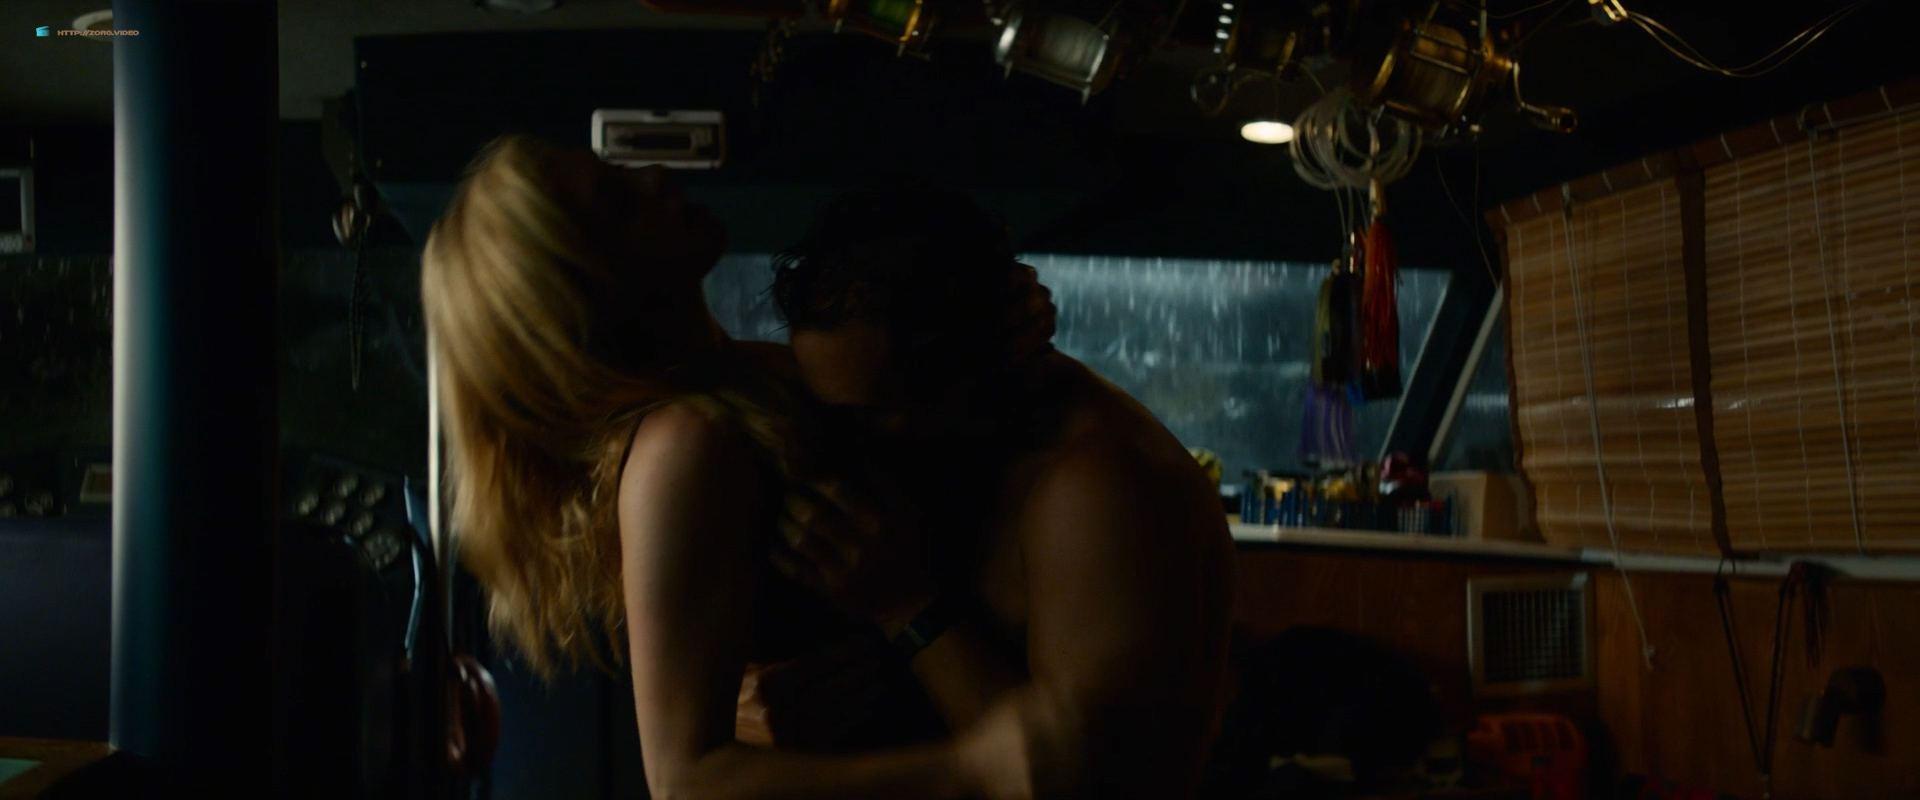 0201153347964_08_Anne-Hathaway-hot-in-sex-scene-Serenity-2019-HD-1080p-BluRay-00009.jpg